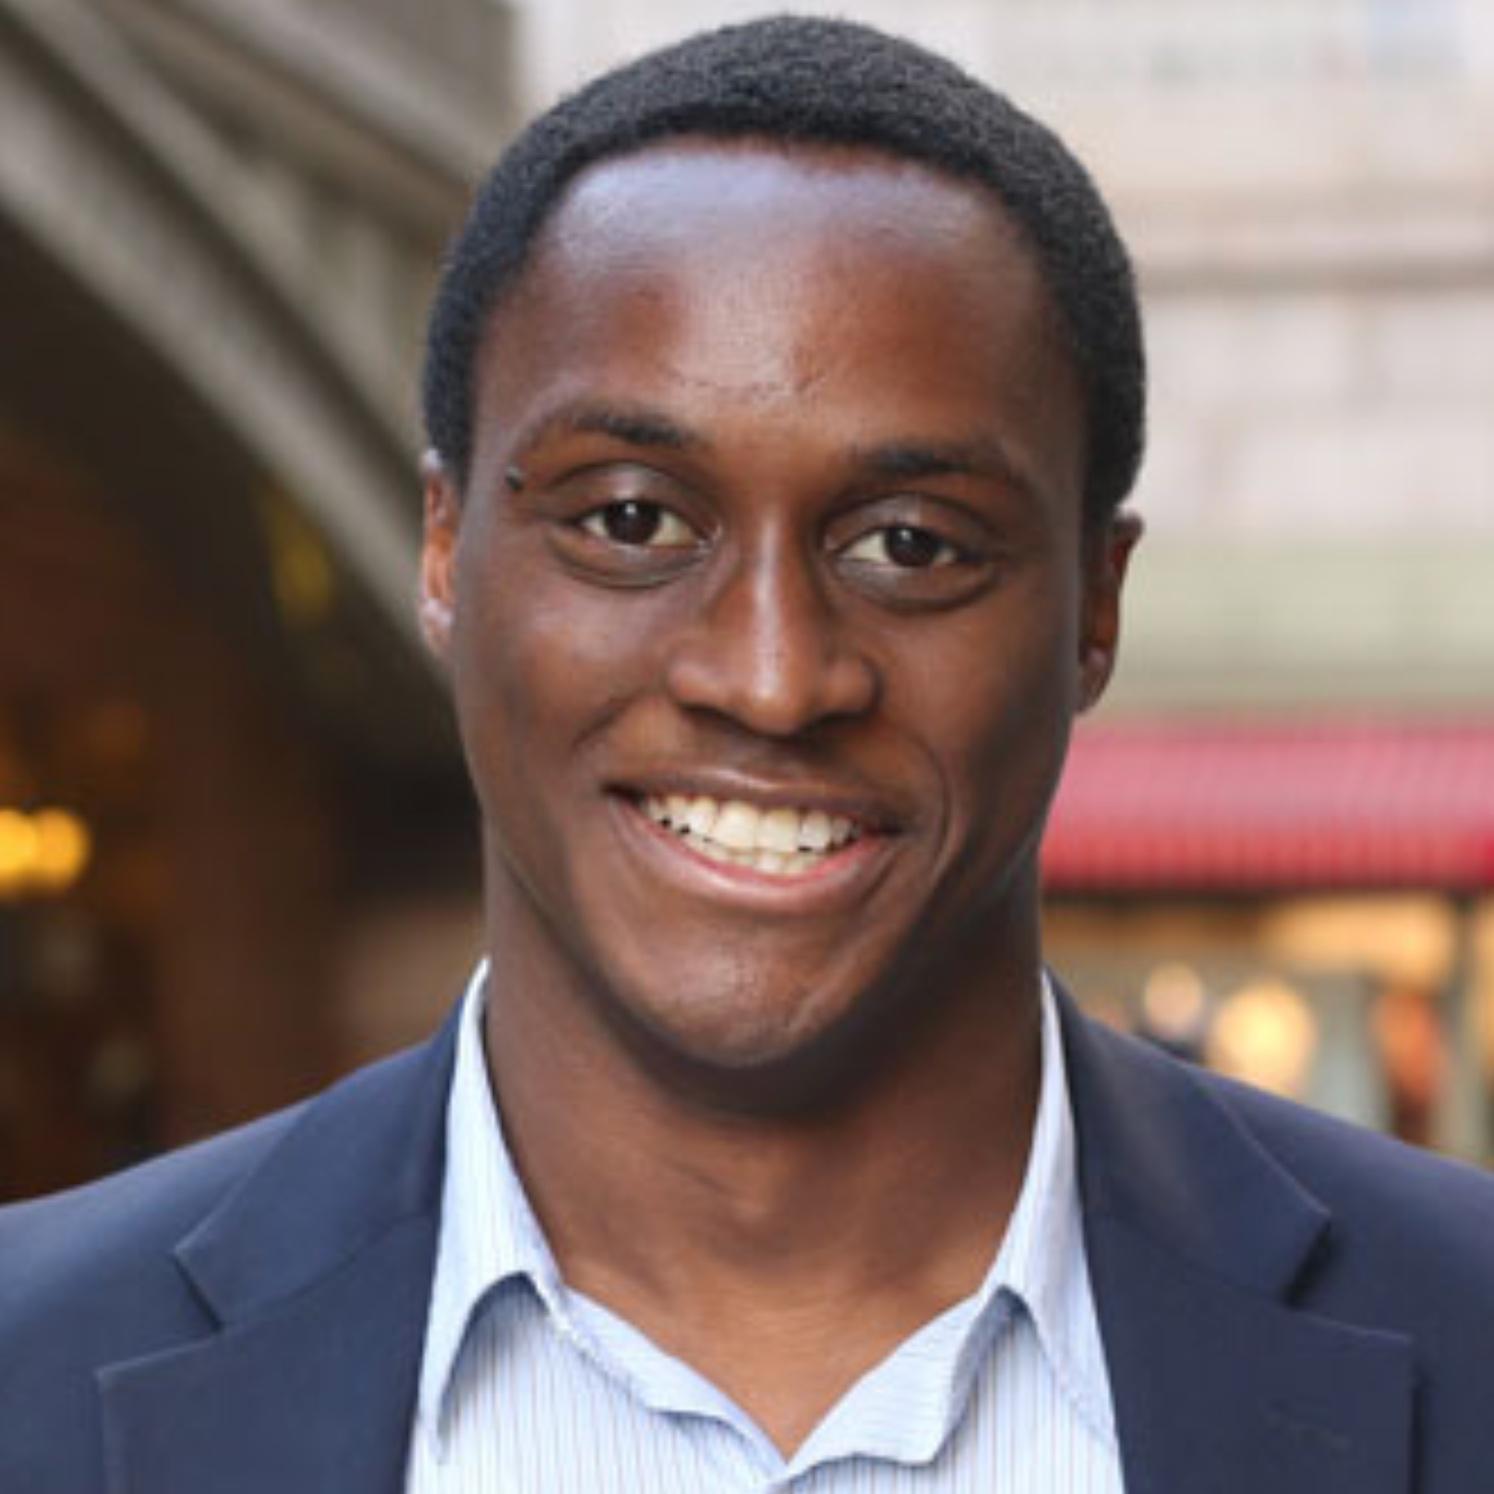 Mene Ukueberuwa  Assistant op-ed editor at the  Wall Street Journal